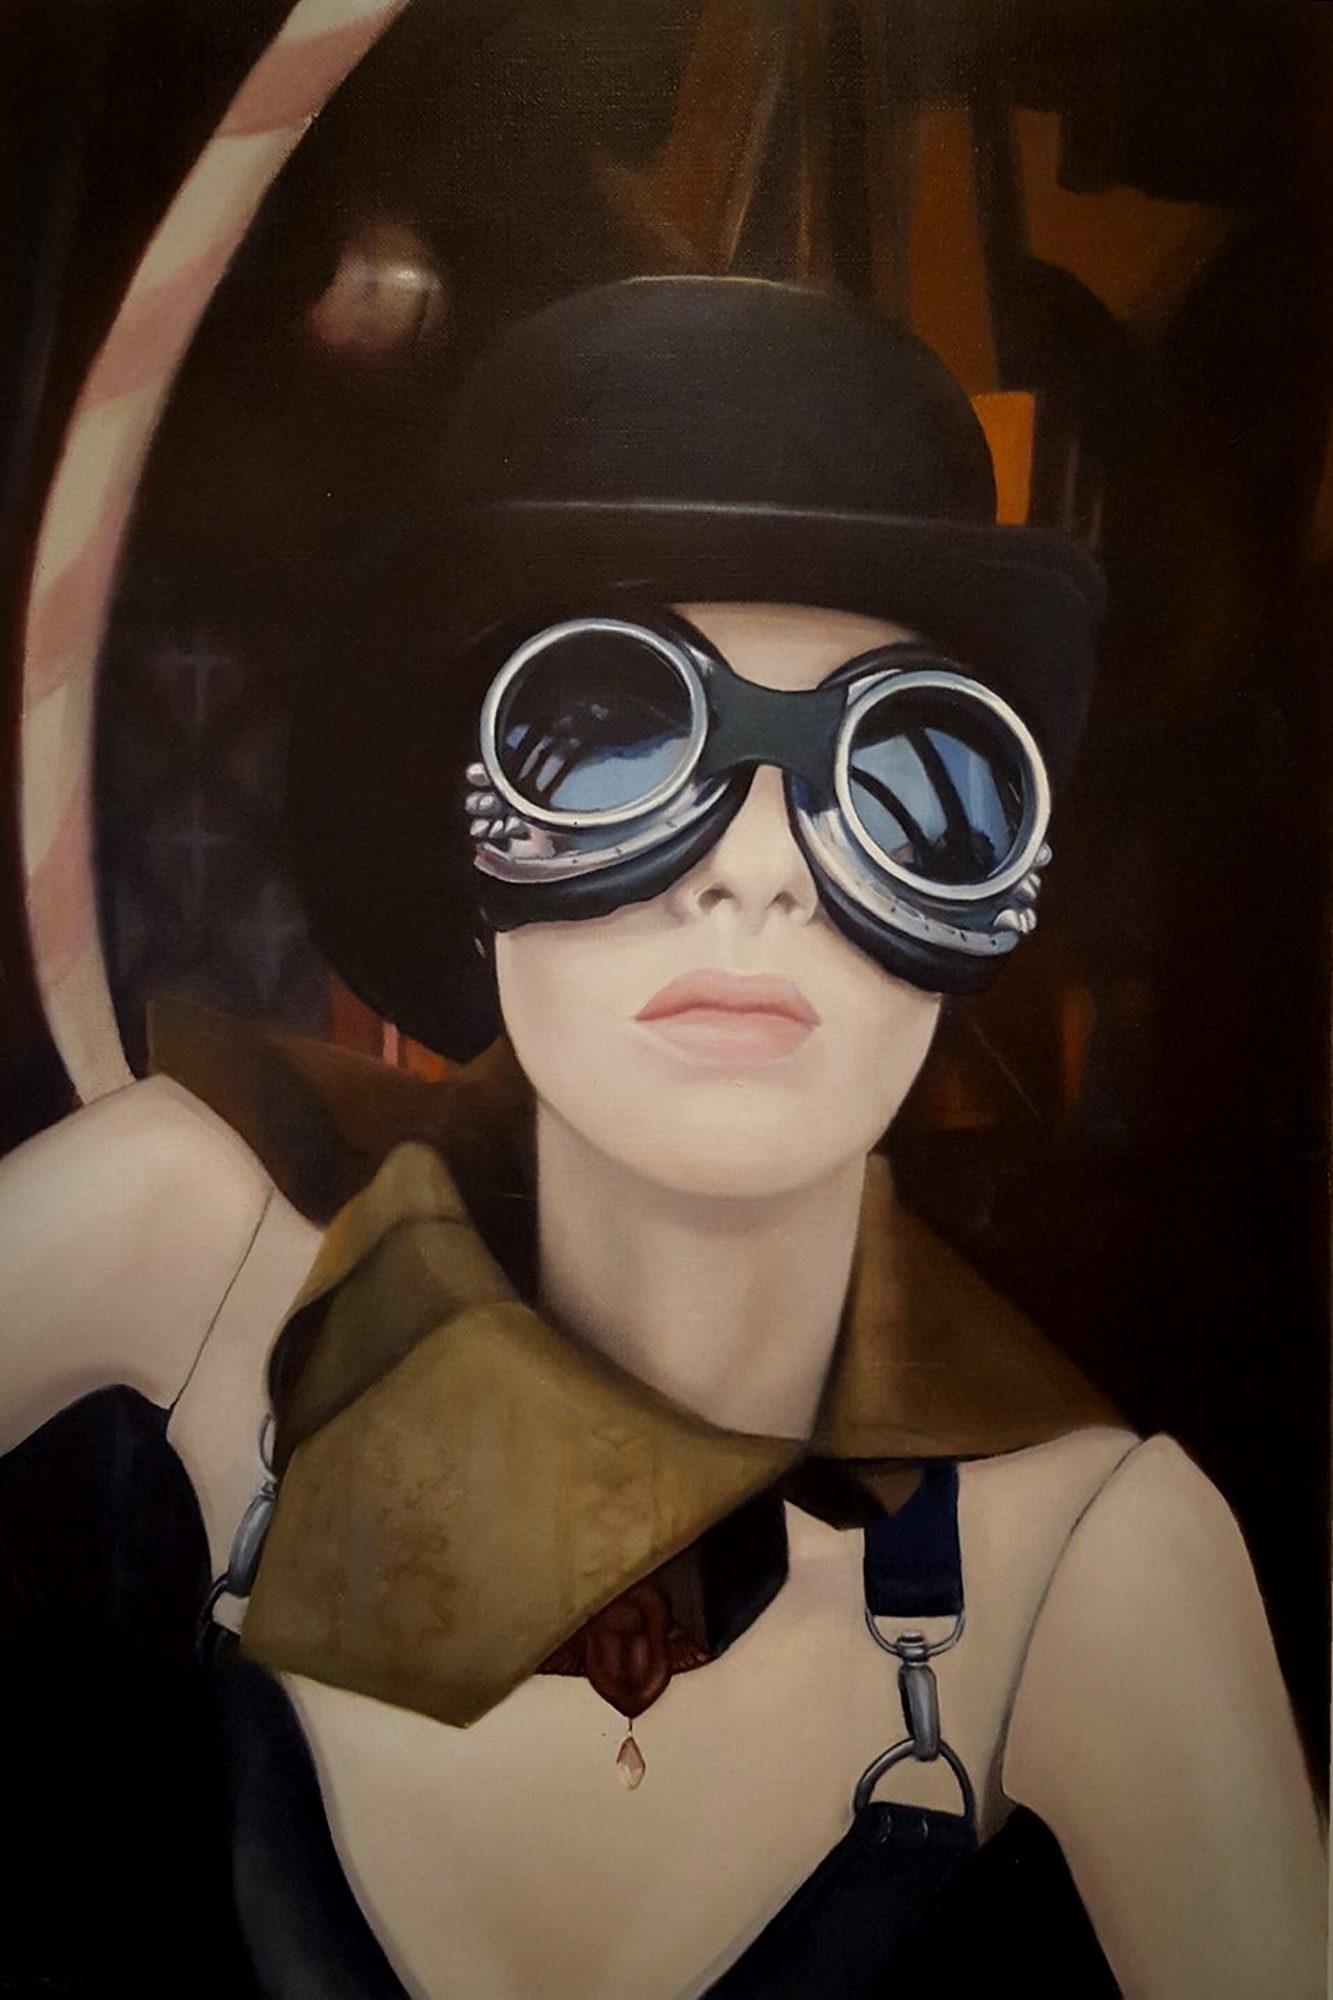 Steam Punk Mannequin With Reflections Sally Davis